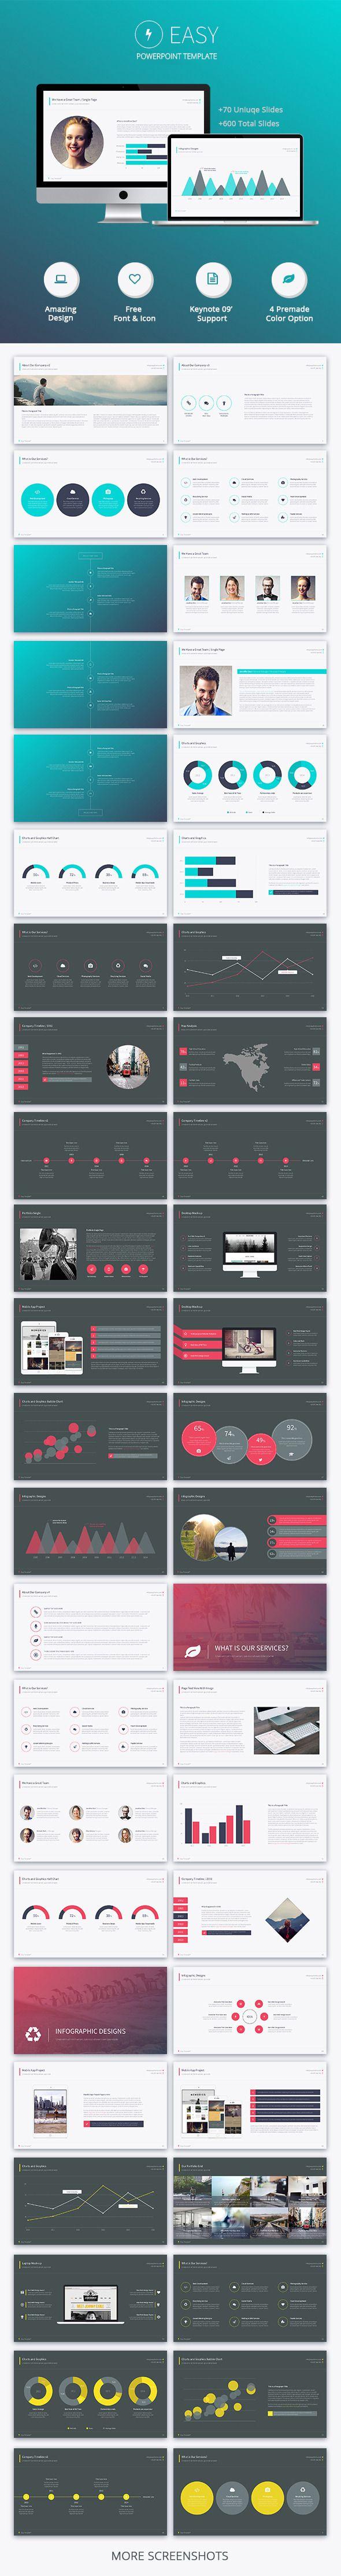 Easy Powerpoint Template #design #slides Download: http://graphicriver.net/item/easy-powerpoint-template/12749854?ref=ksioks